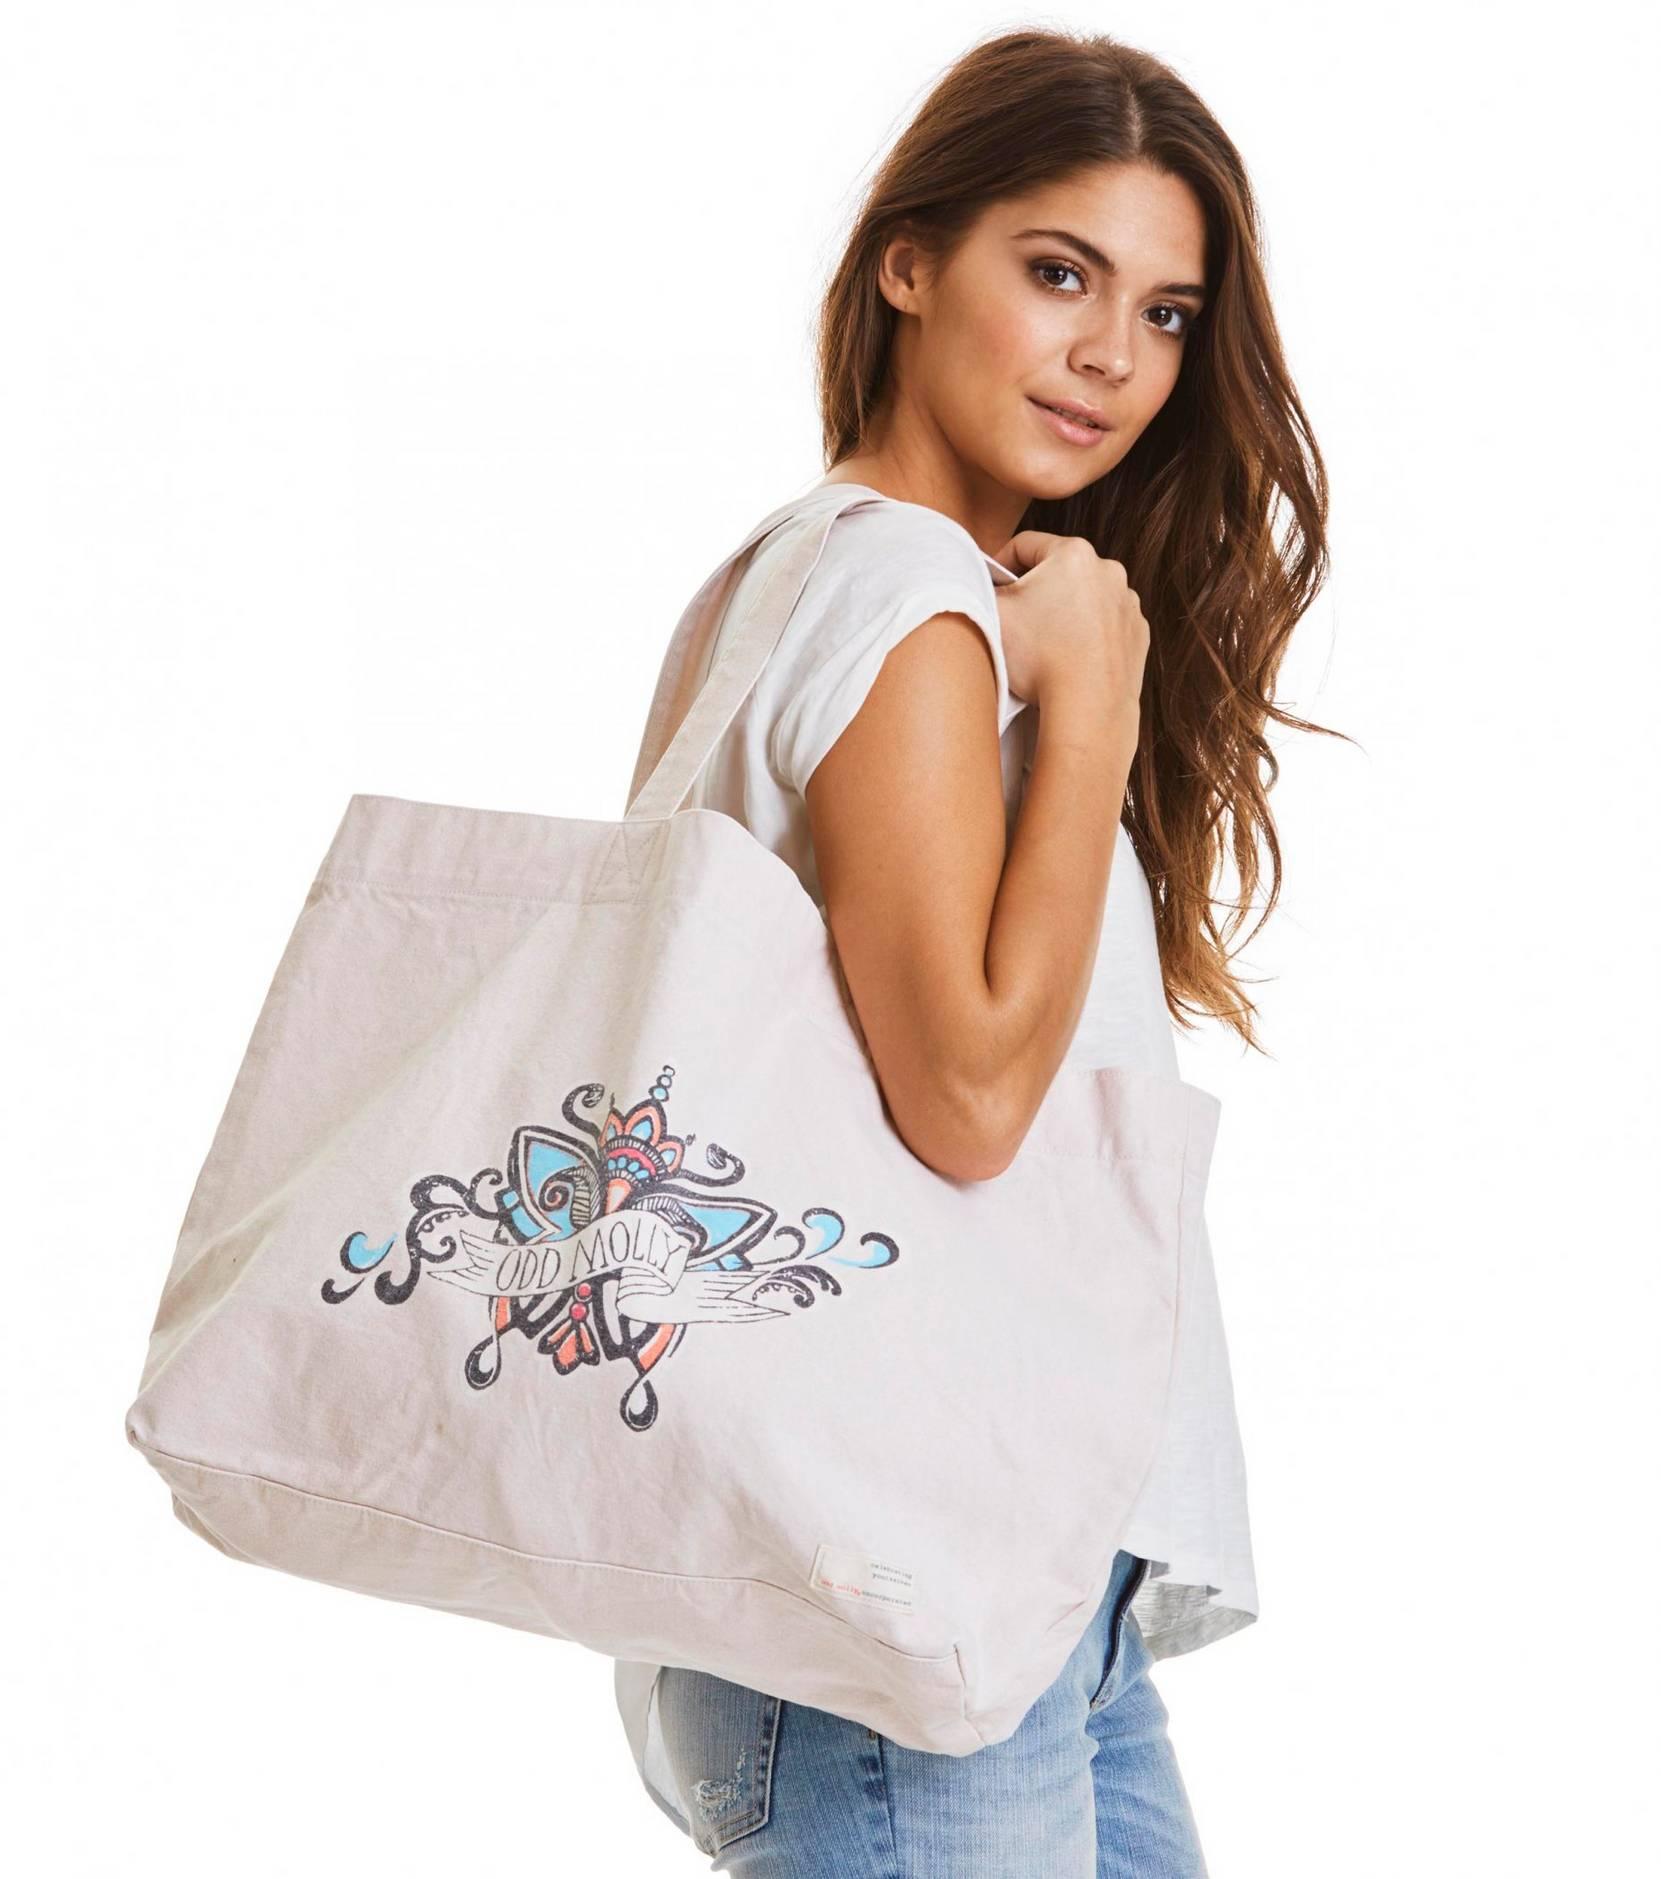 Caring bag -kassi